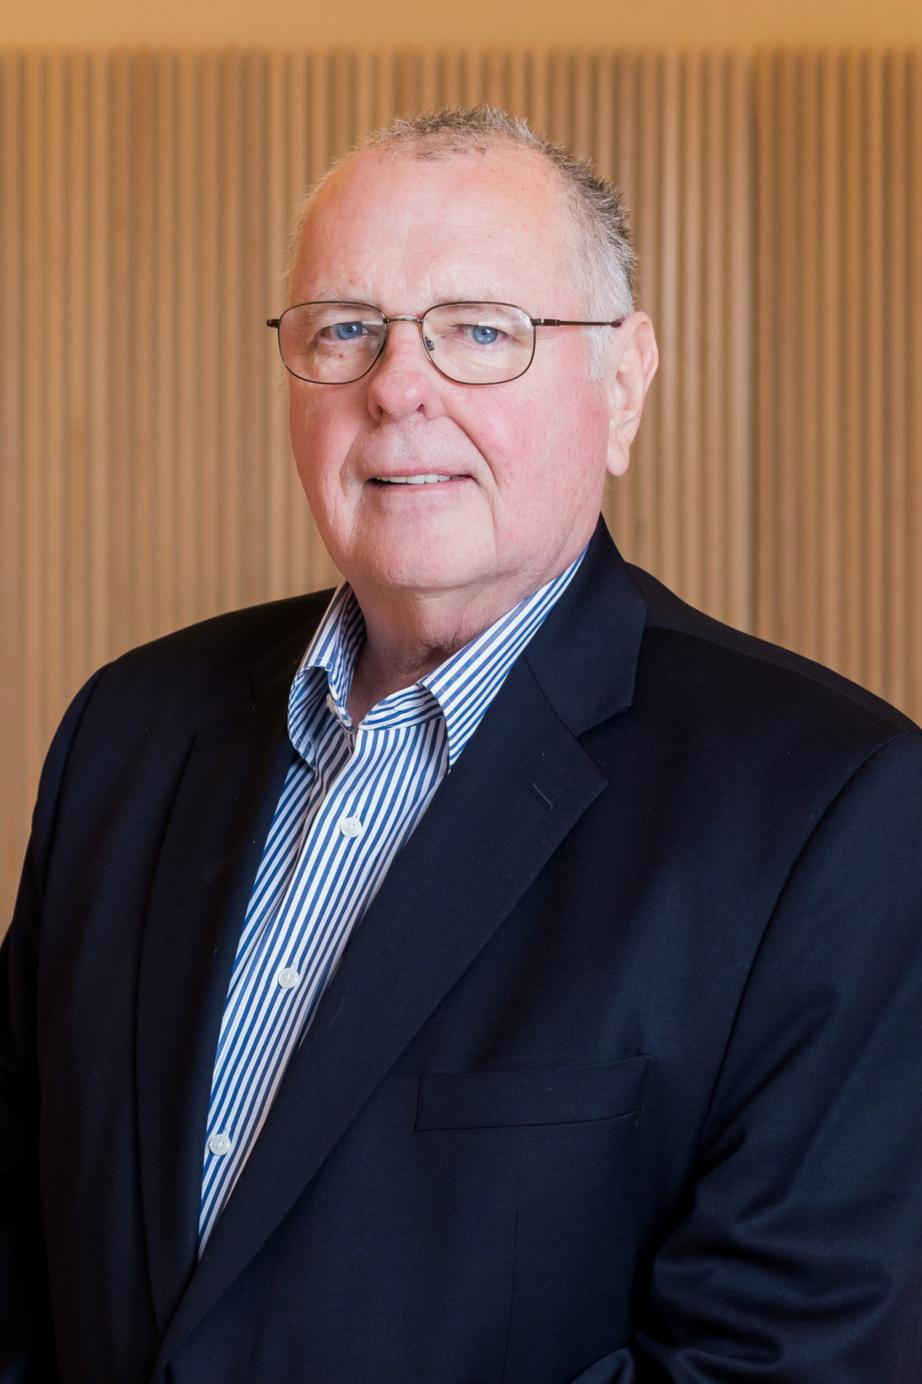 Gregory J. Dennis - Industry Lead